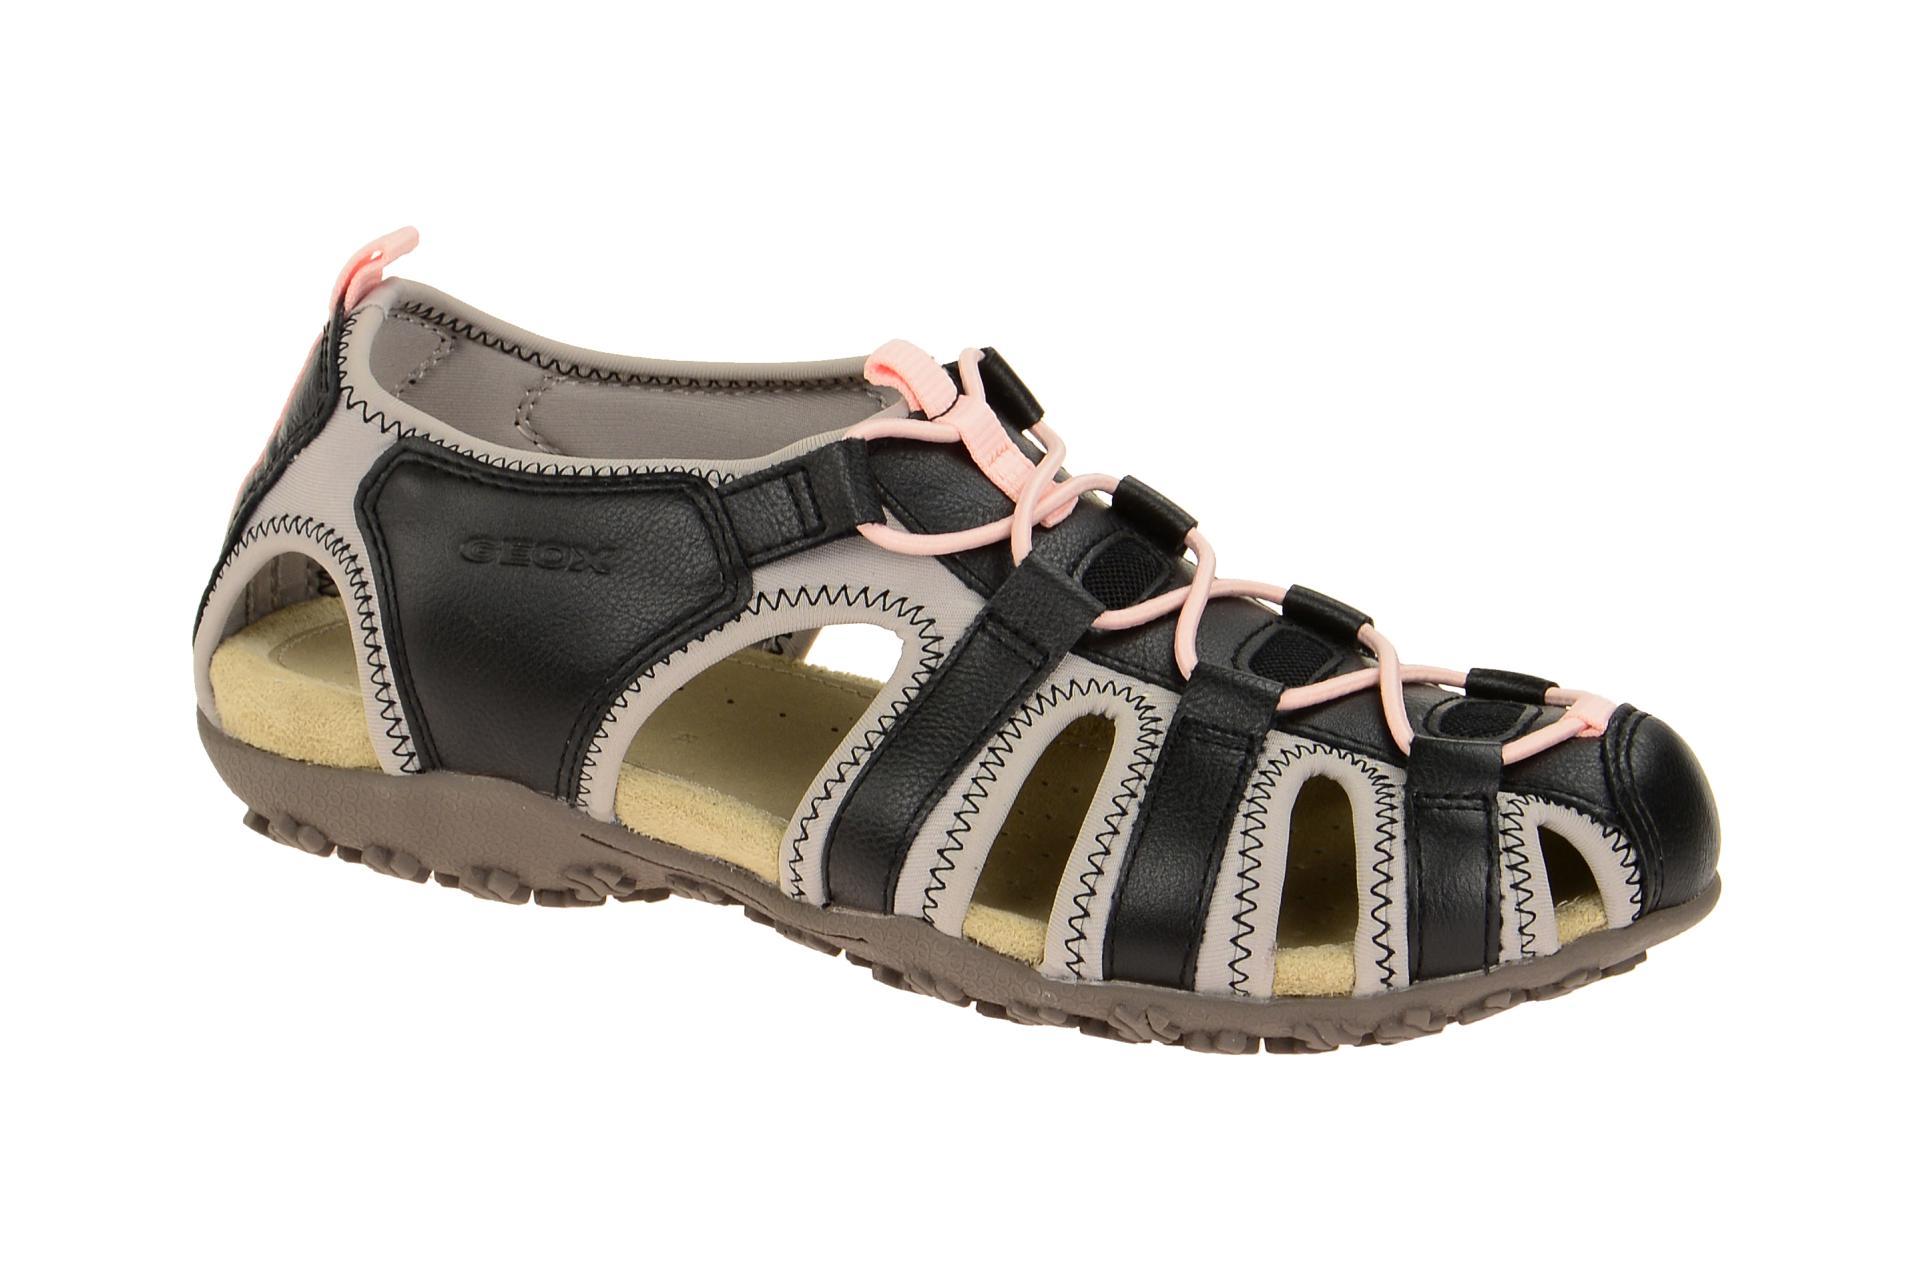 C9263 Sandale Details 05415 Damen Zu Neu Schuhe Geox Schwarz Sand strel D7125u JFK1lc